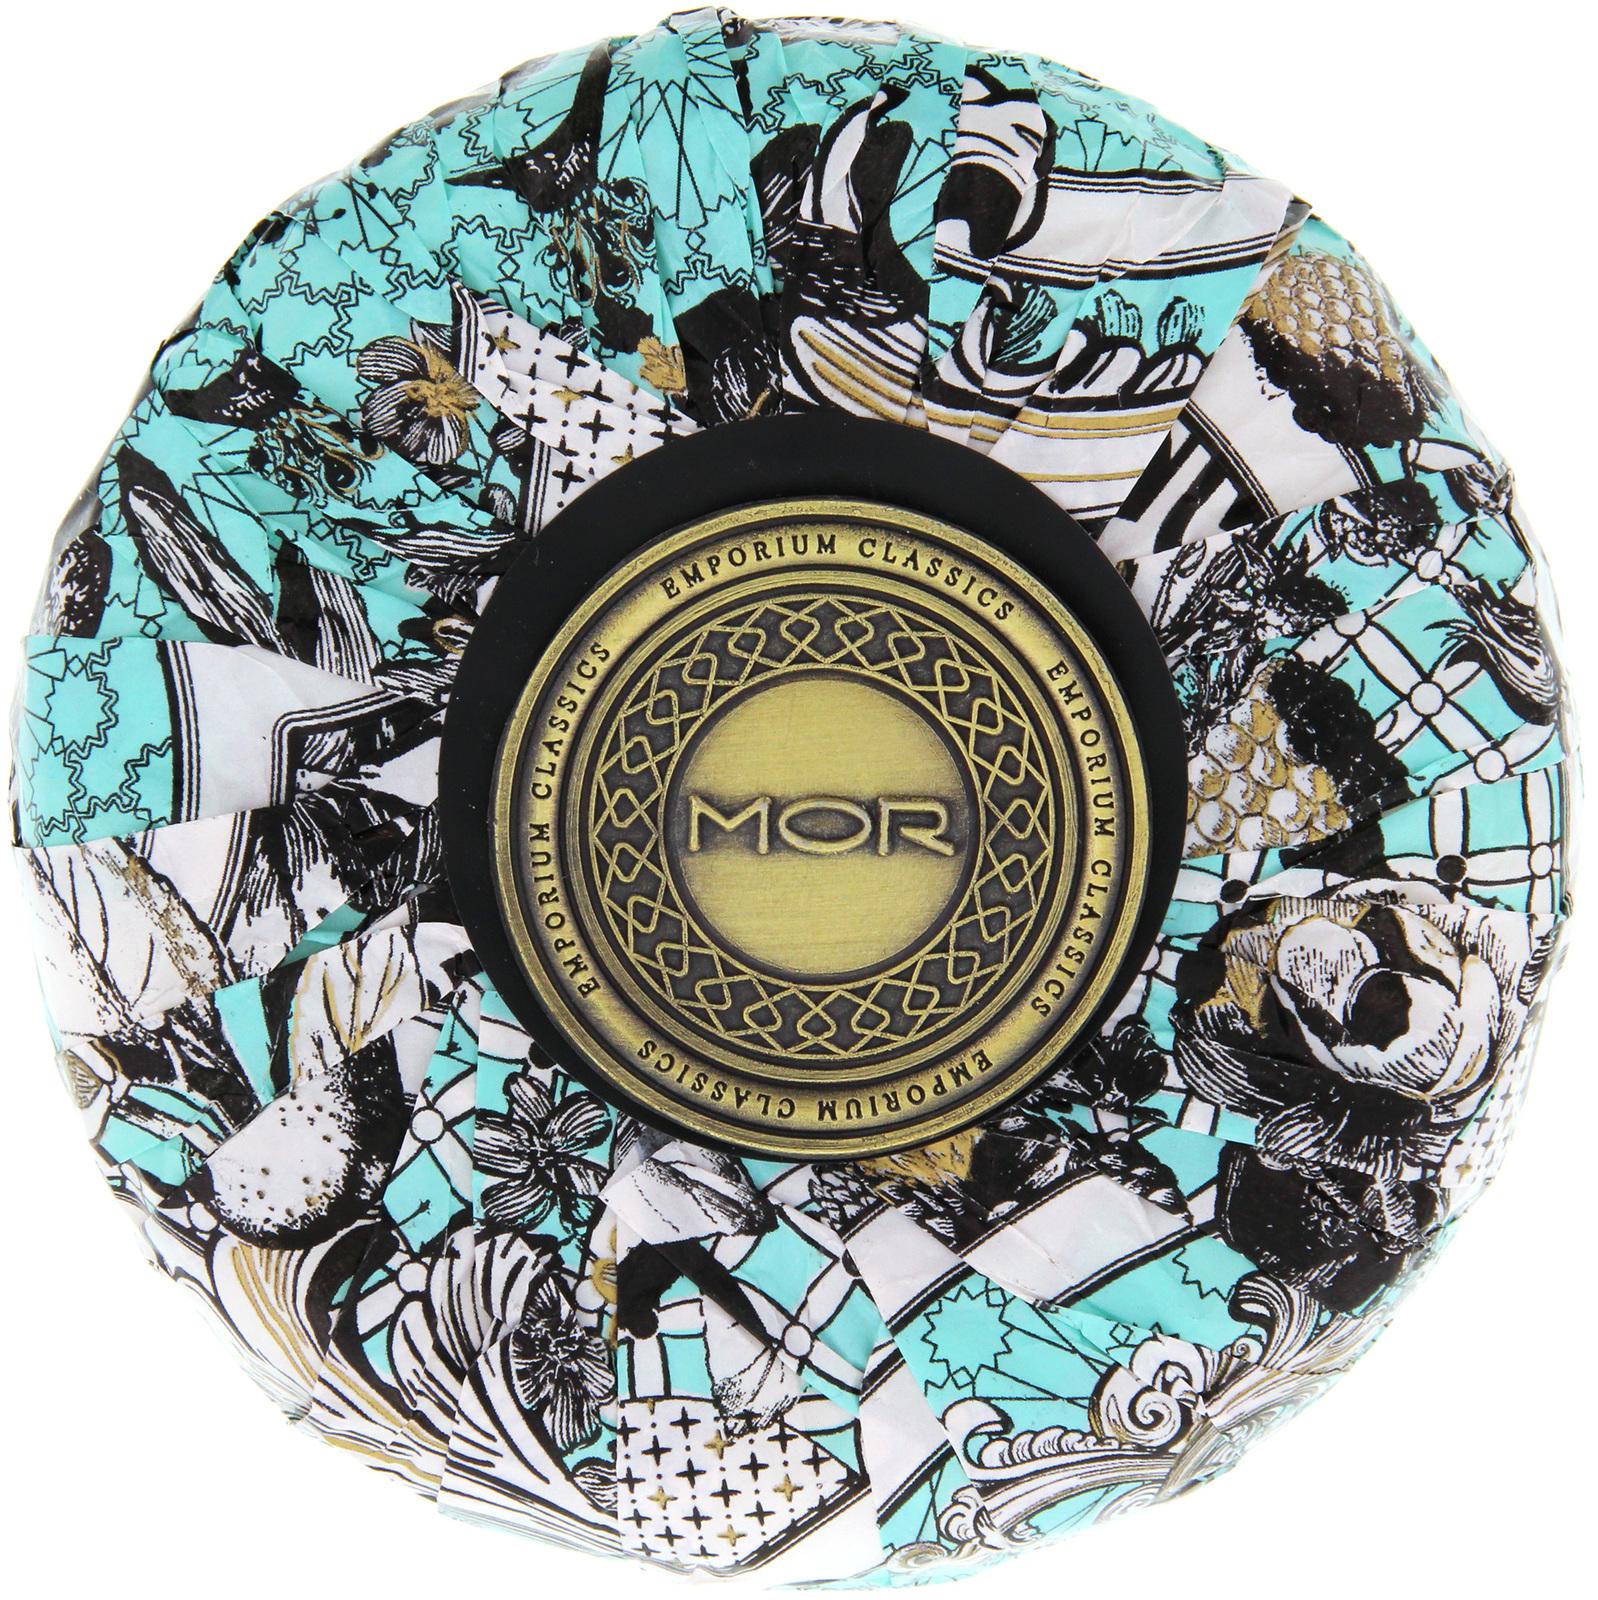 MOR Emporium Classic Triple-Milled Soap - Bohemienne (180g) image